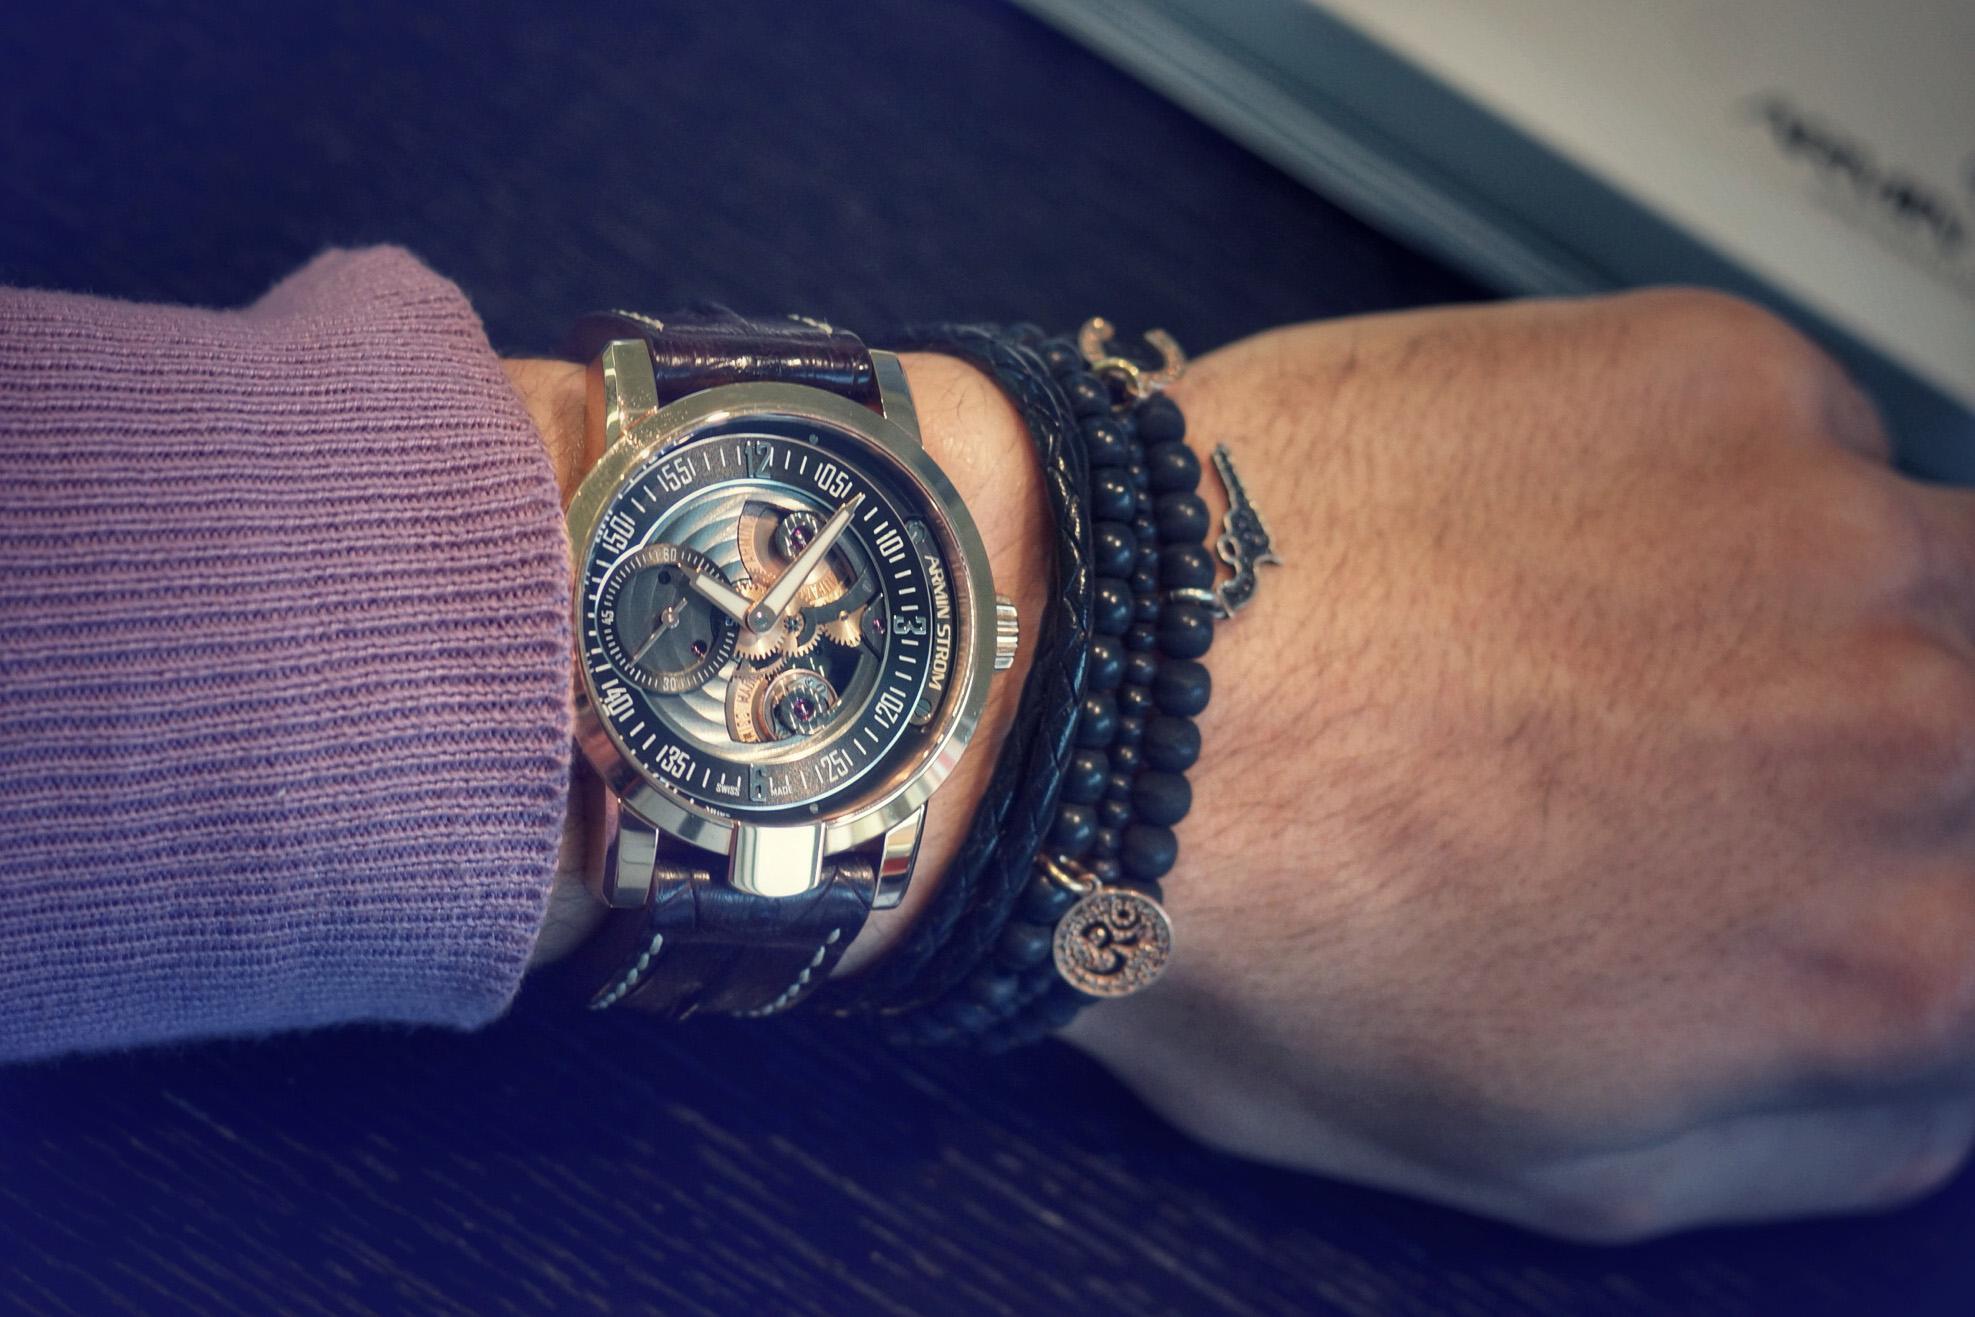 Armin Strom Gravity - Wristshot